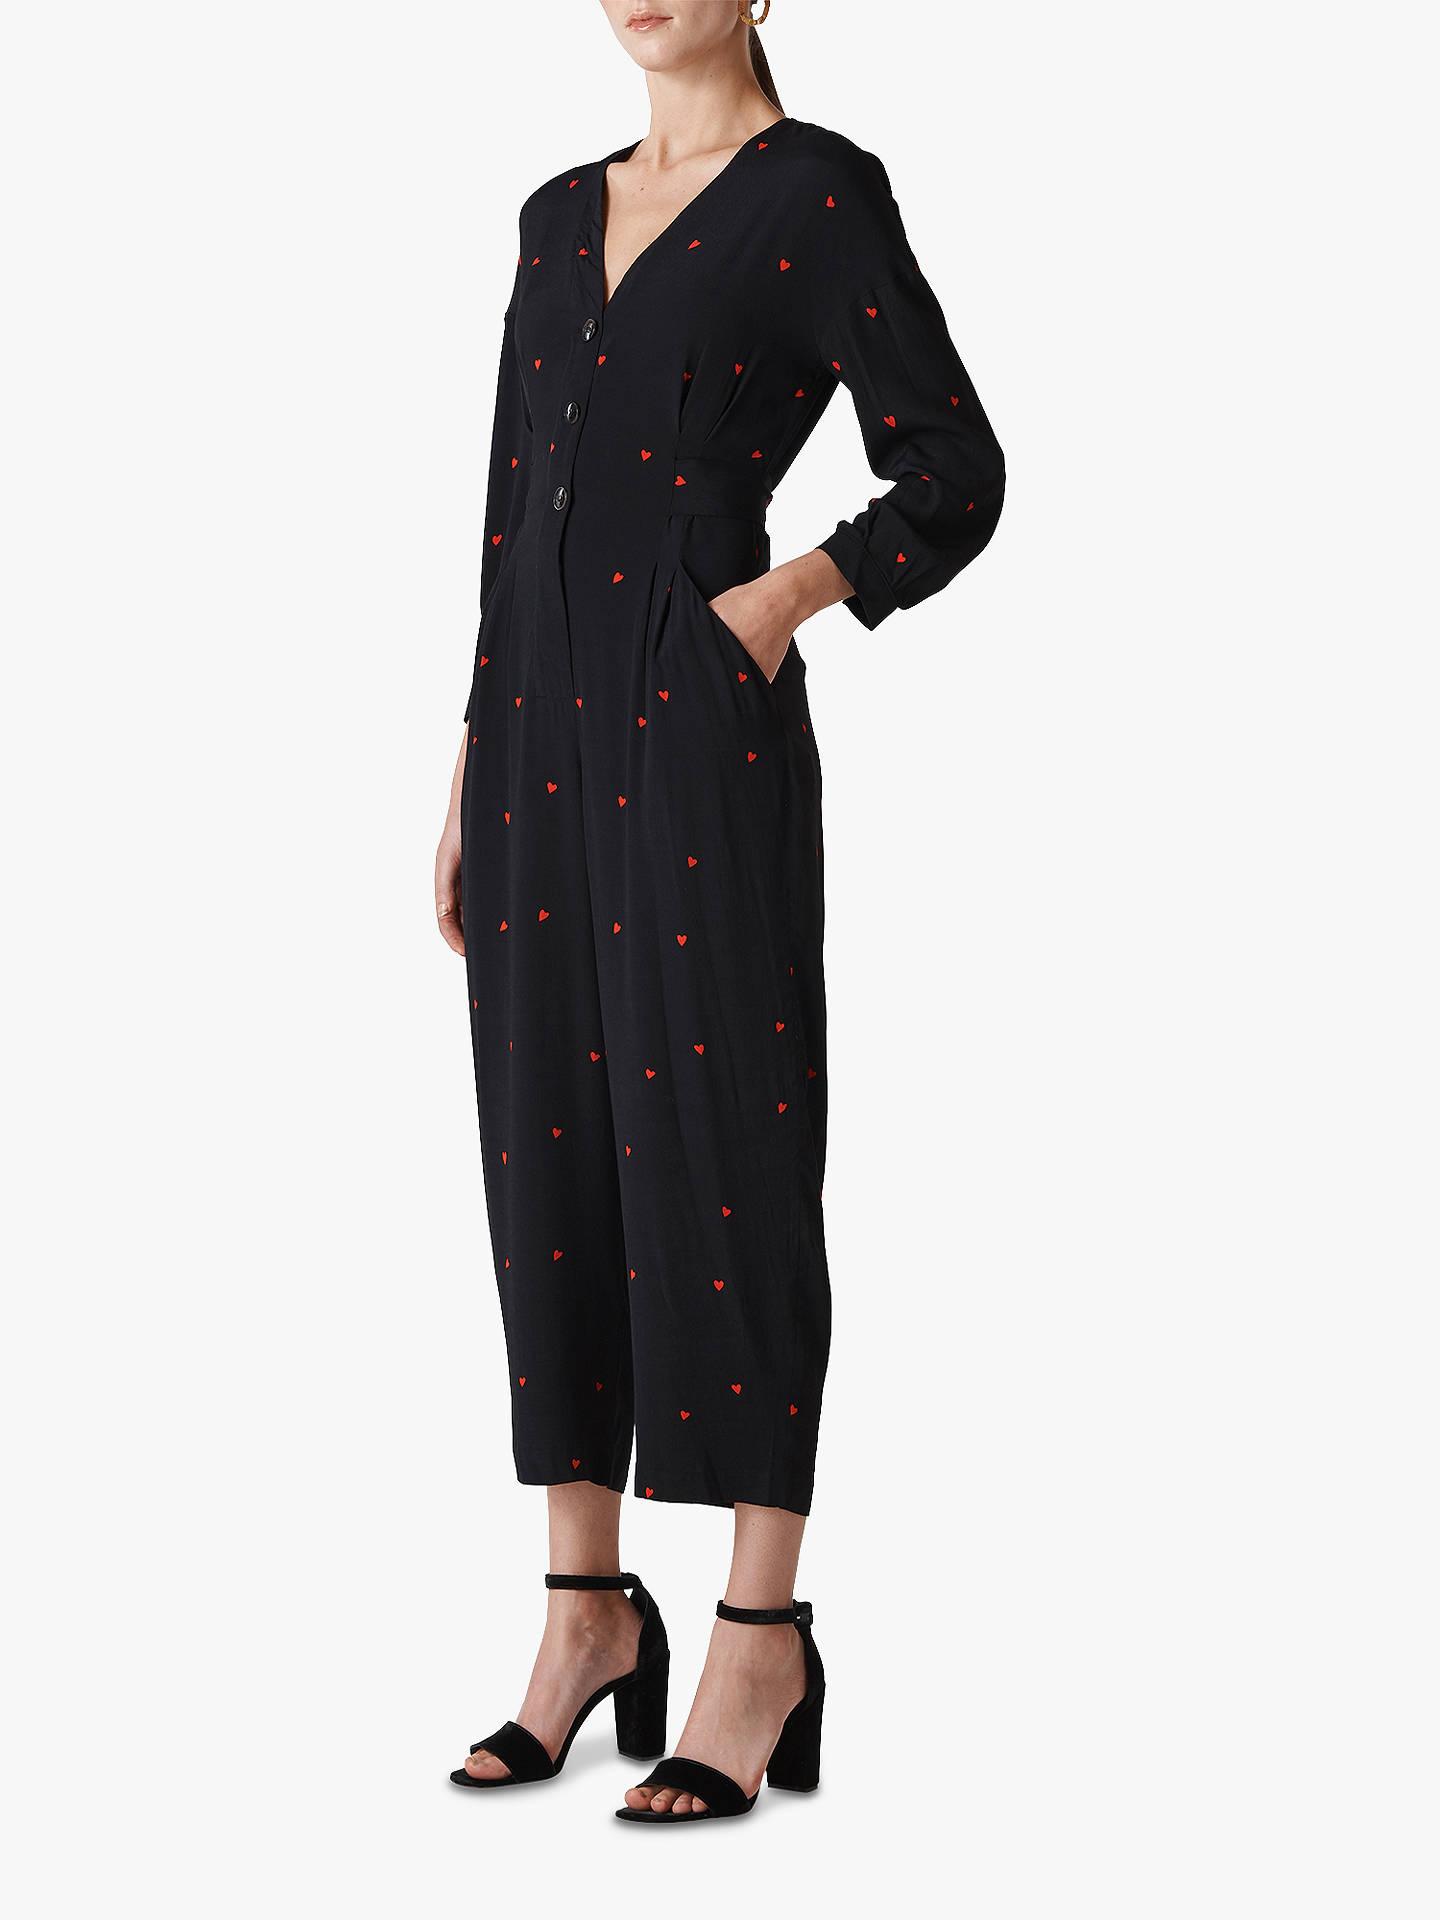 dac630d834 Buy Whistles Heart Print Tie Jumpsuit